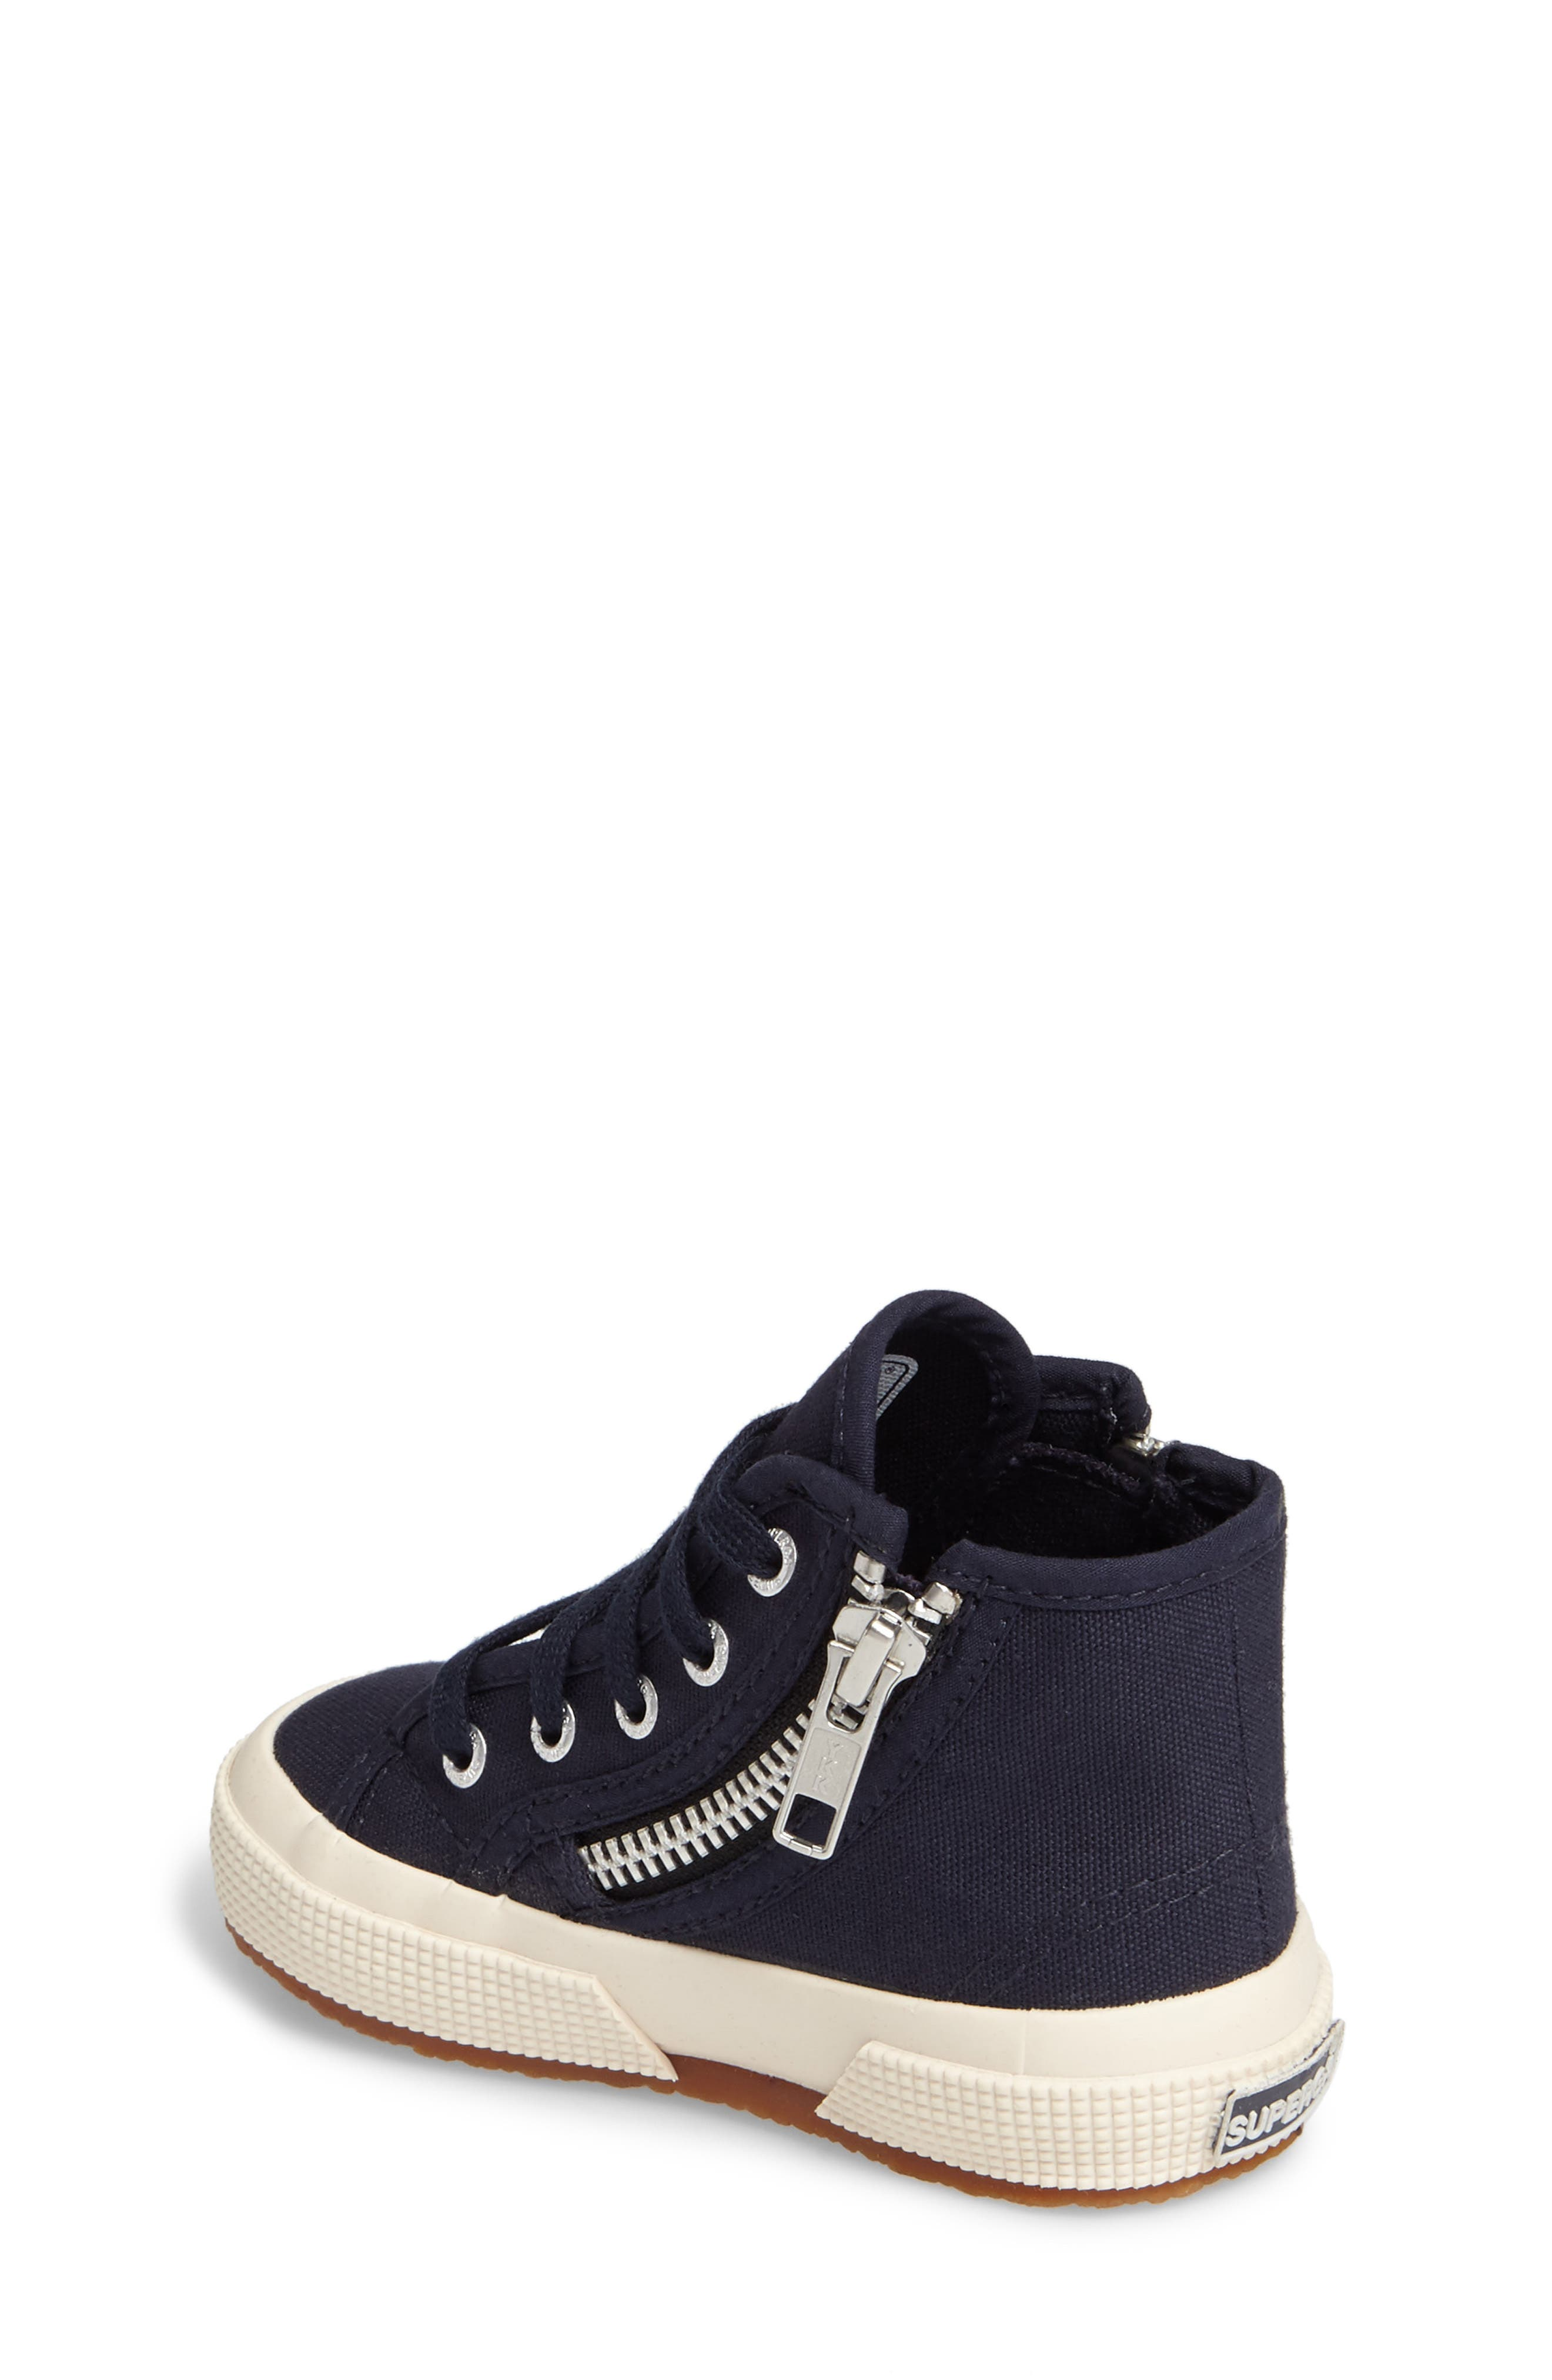 Alternate Image 2  - Superga Zip High Top Sneaker (Walker, Toddler & Little Kid)